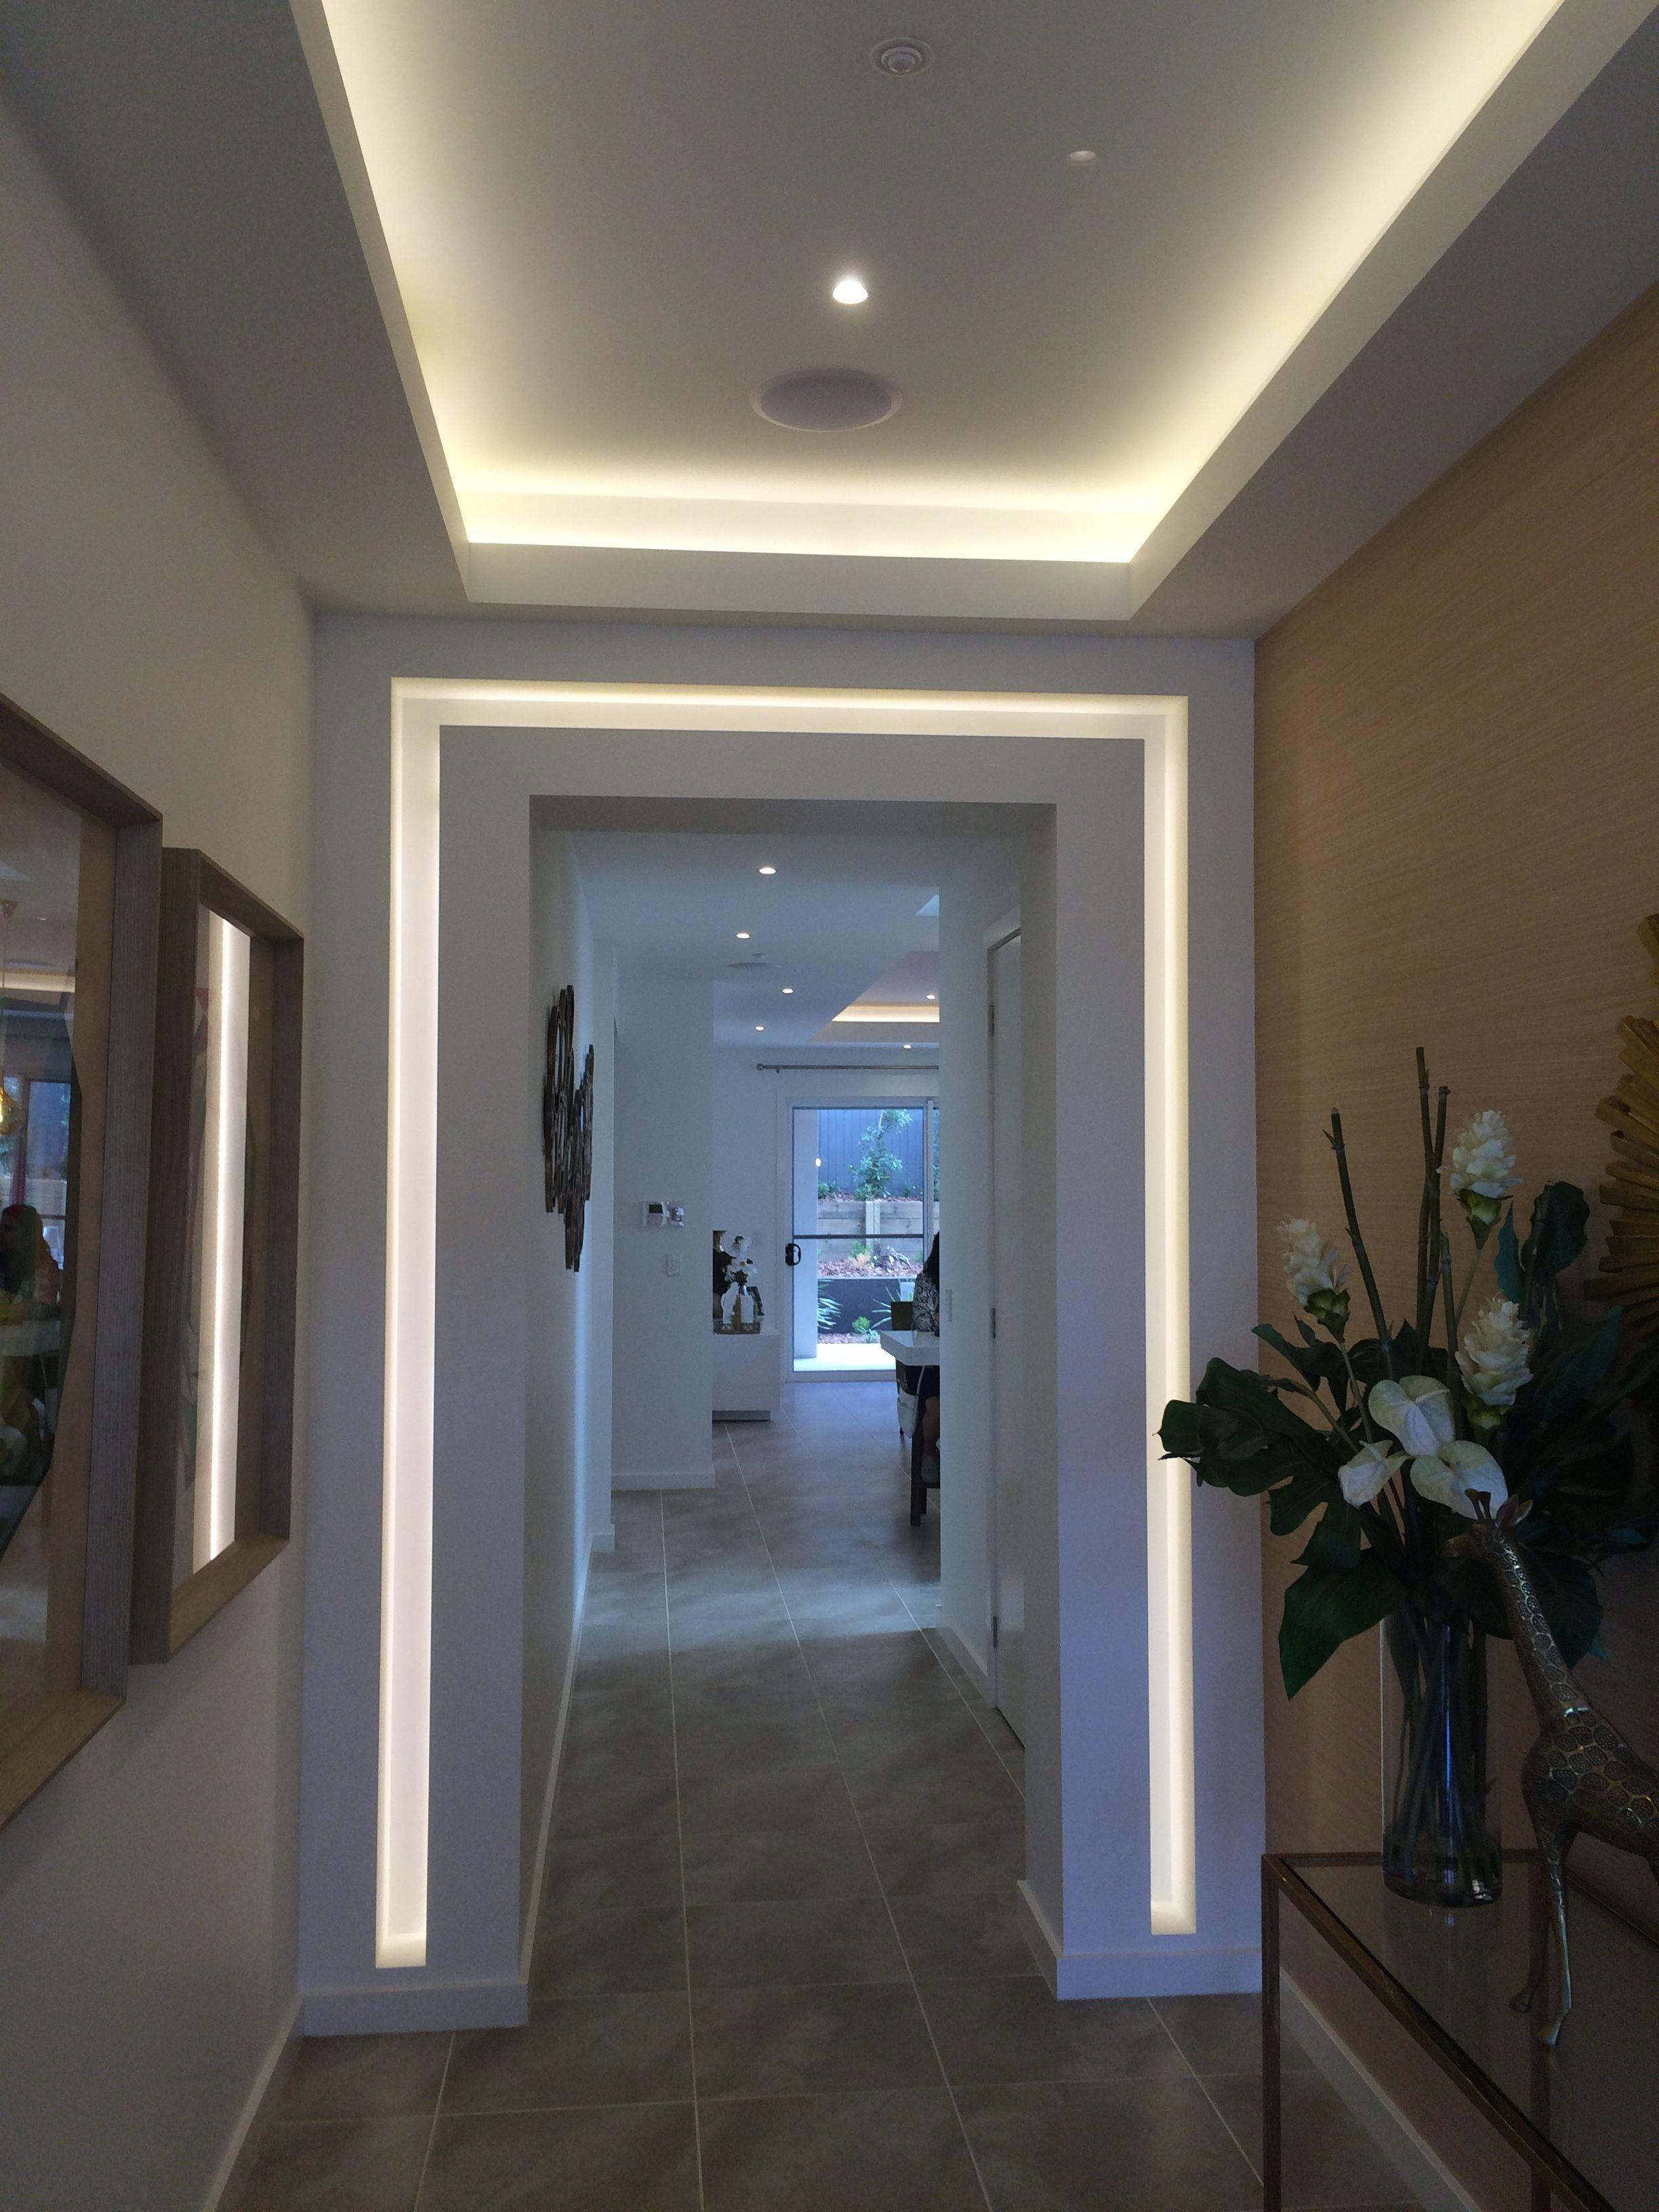 Lighting for entrance or hallway | Modern hallway, Ceiling ...